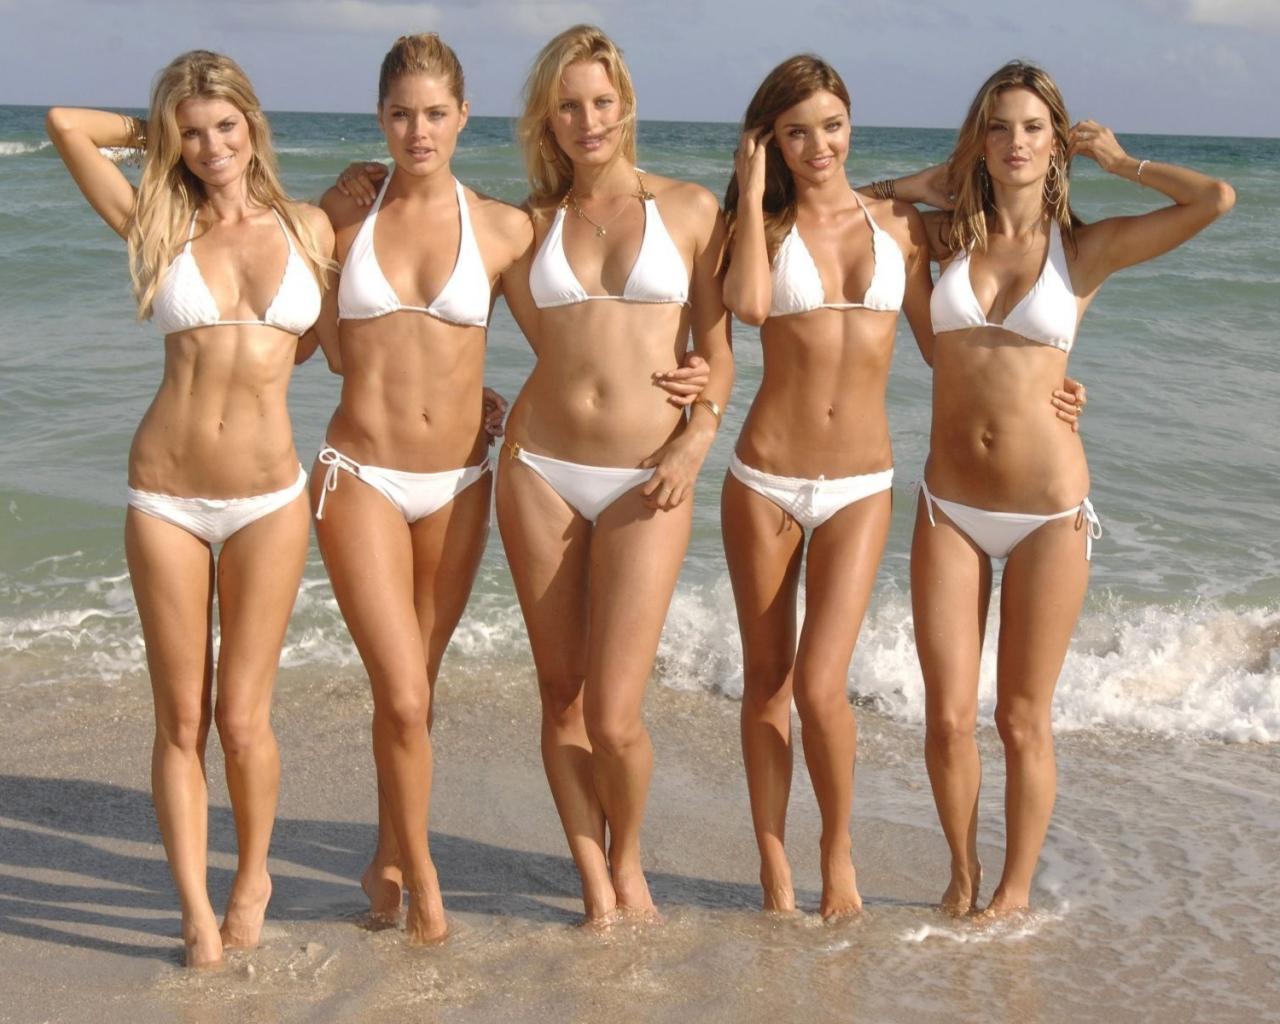 Фото девчонки на пляже 5 фотография